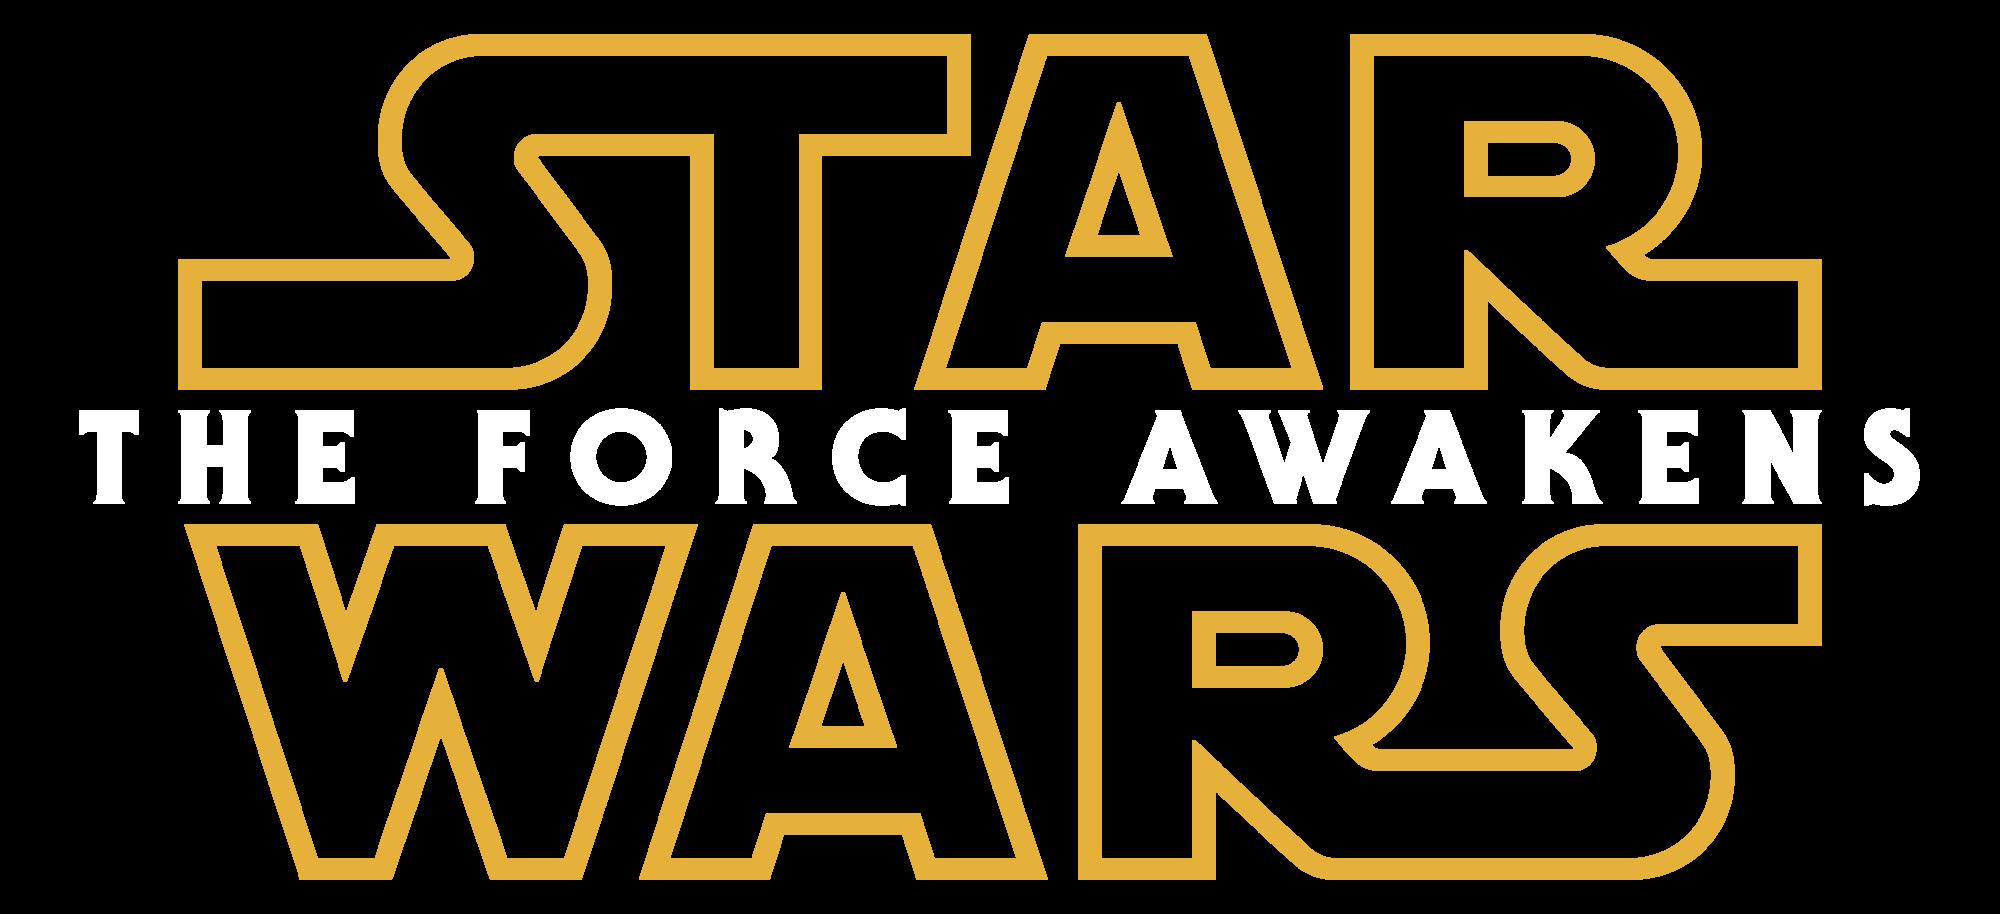 Star wars empire clipart clip transparent stock Star wars logo PNG images clip transparent stock